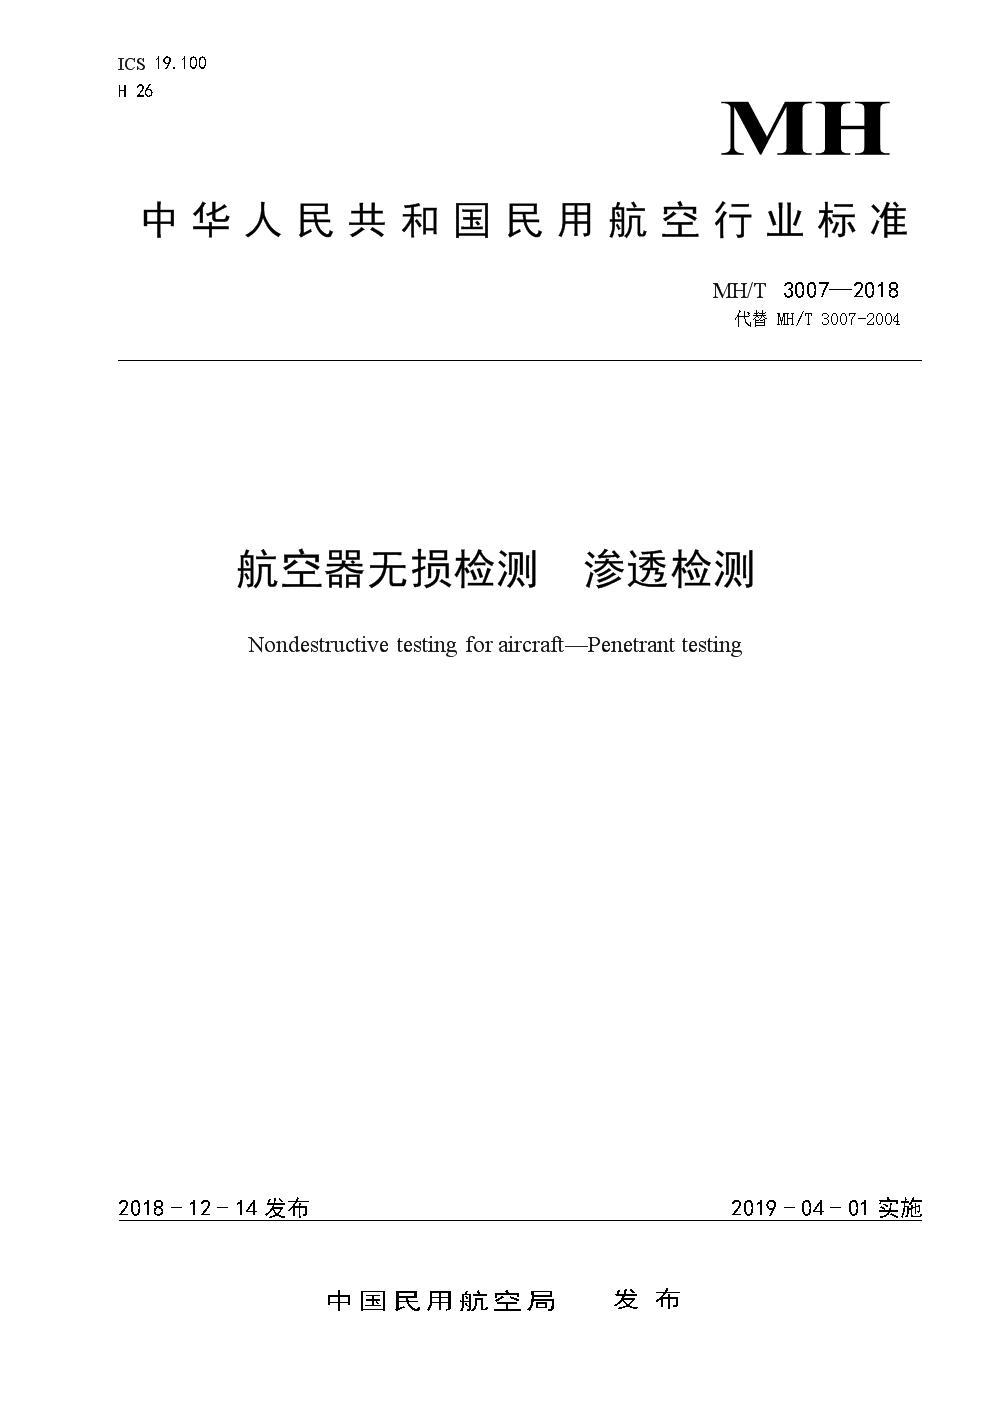 MH/T 3007-2018  航空器无损检测 渗透检测.docx